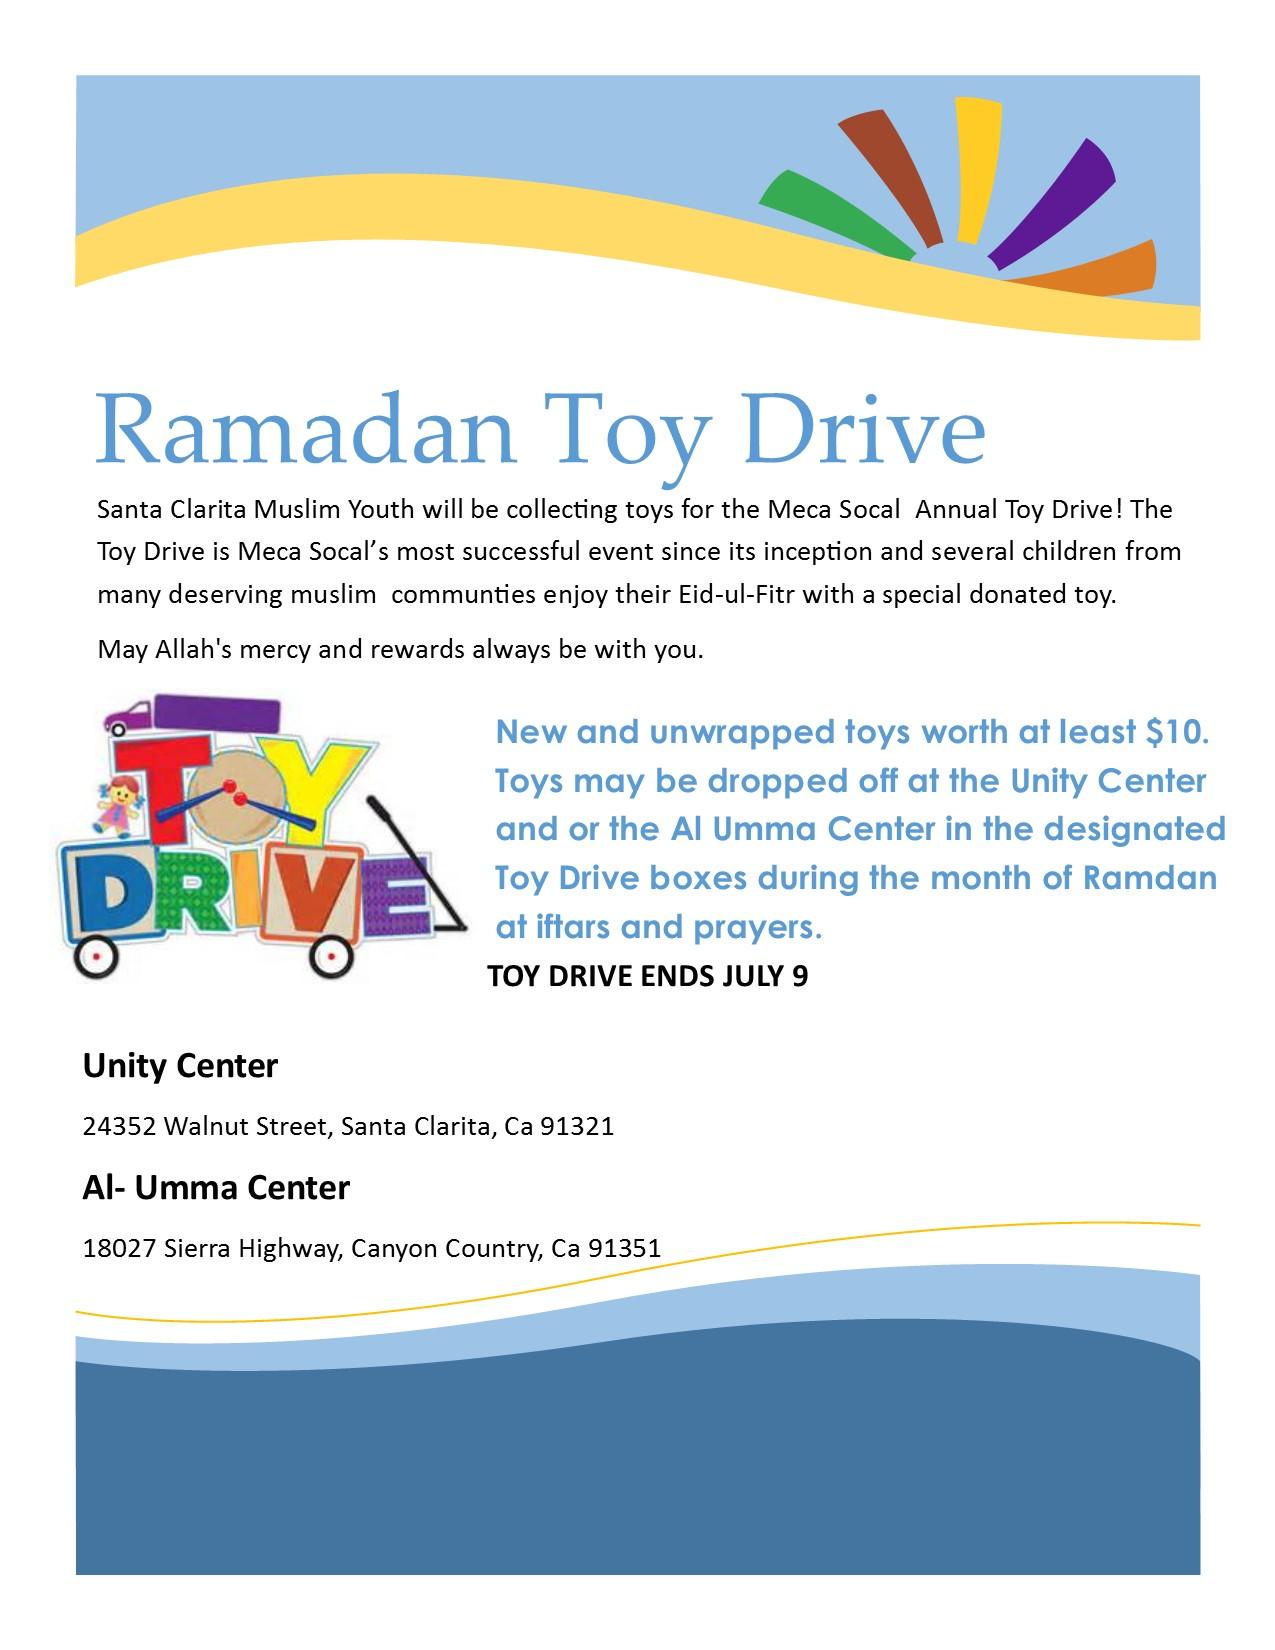 Ramadan 2015 Toy Drive